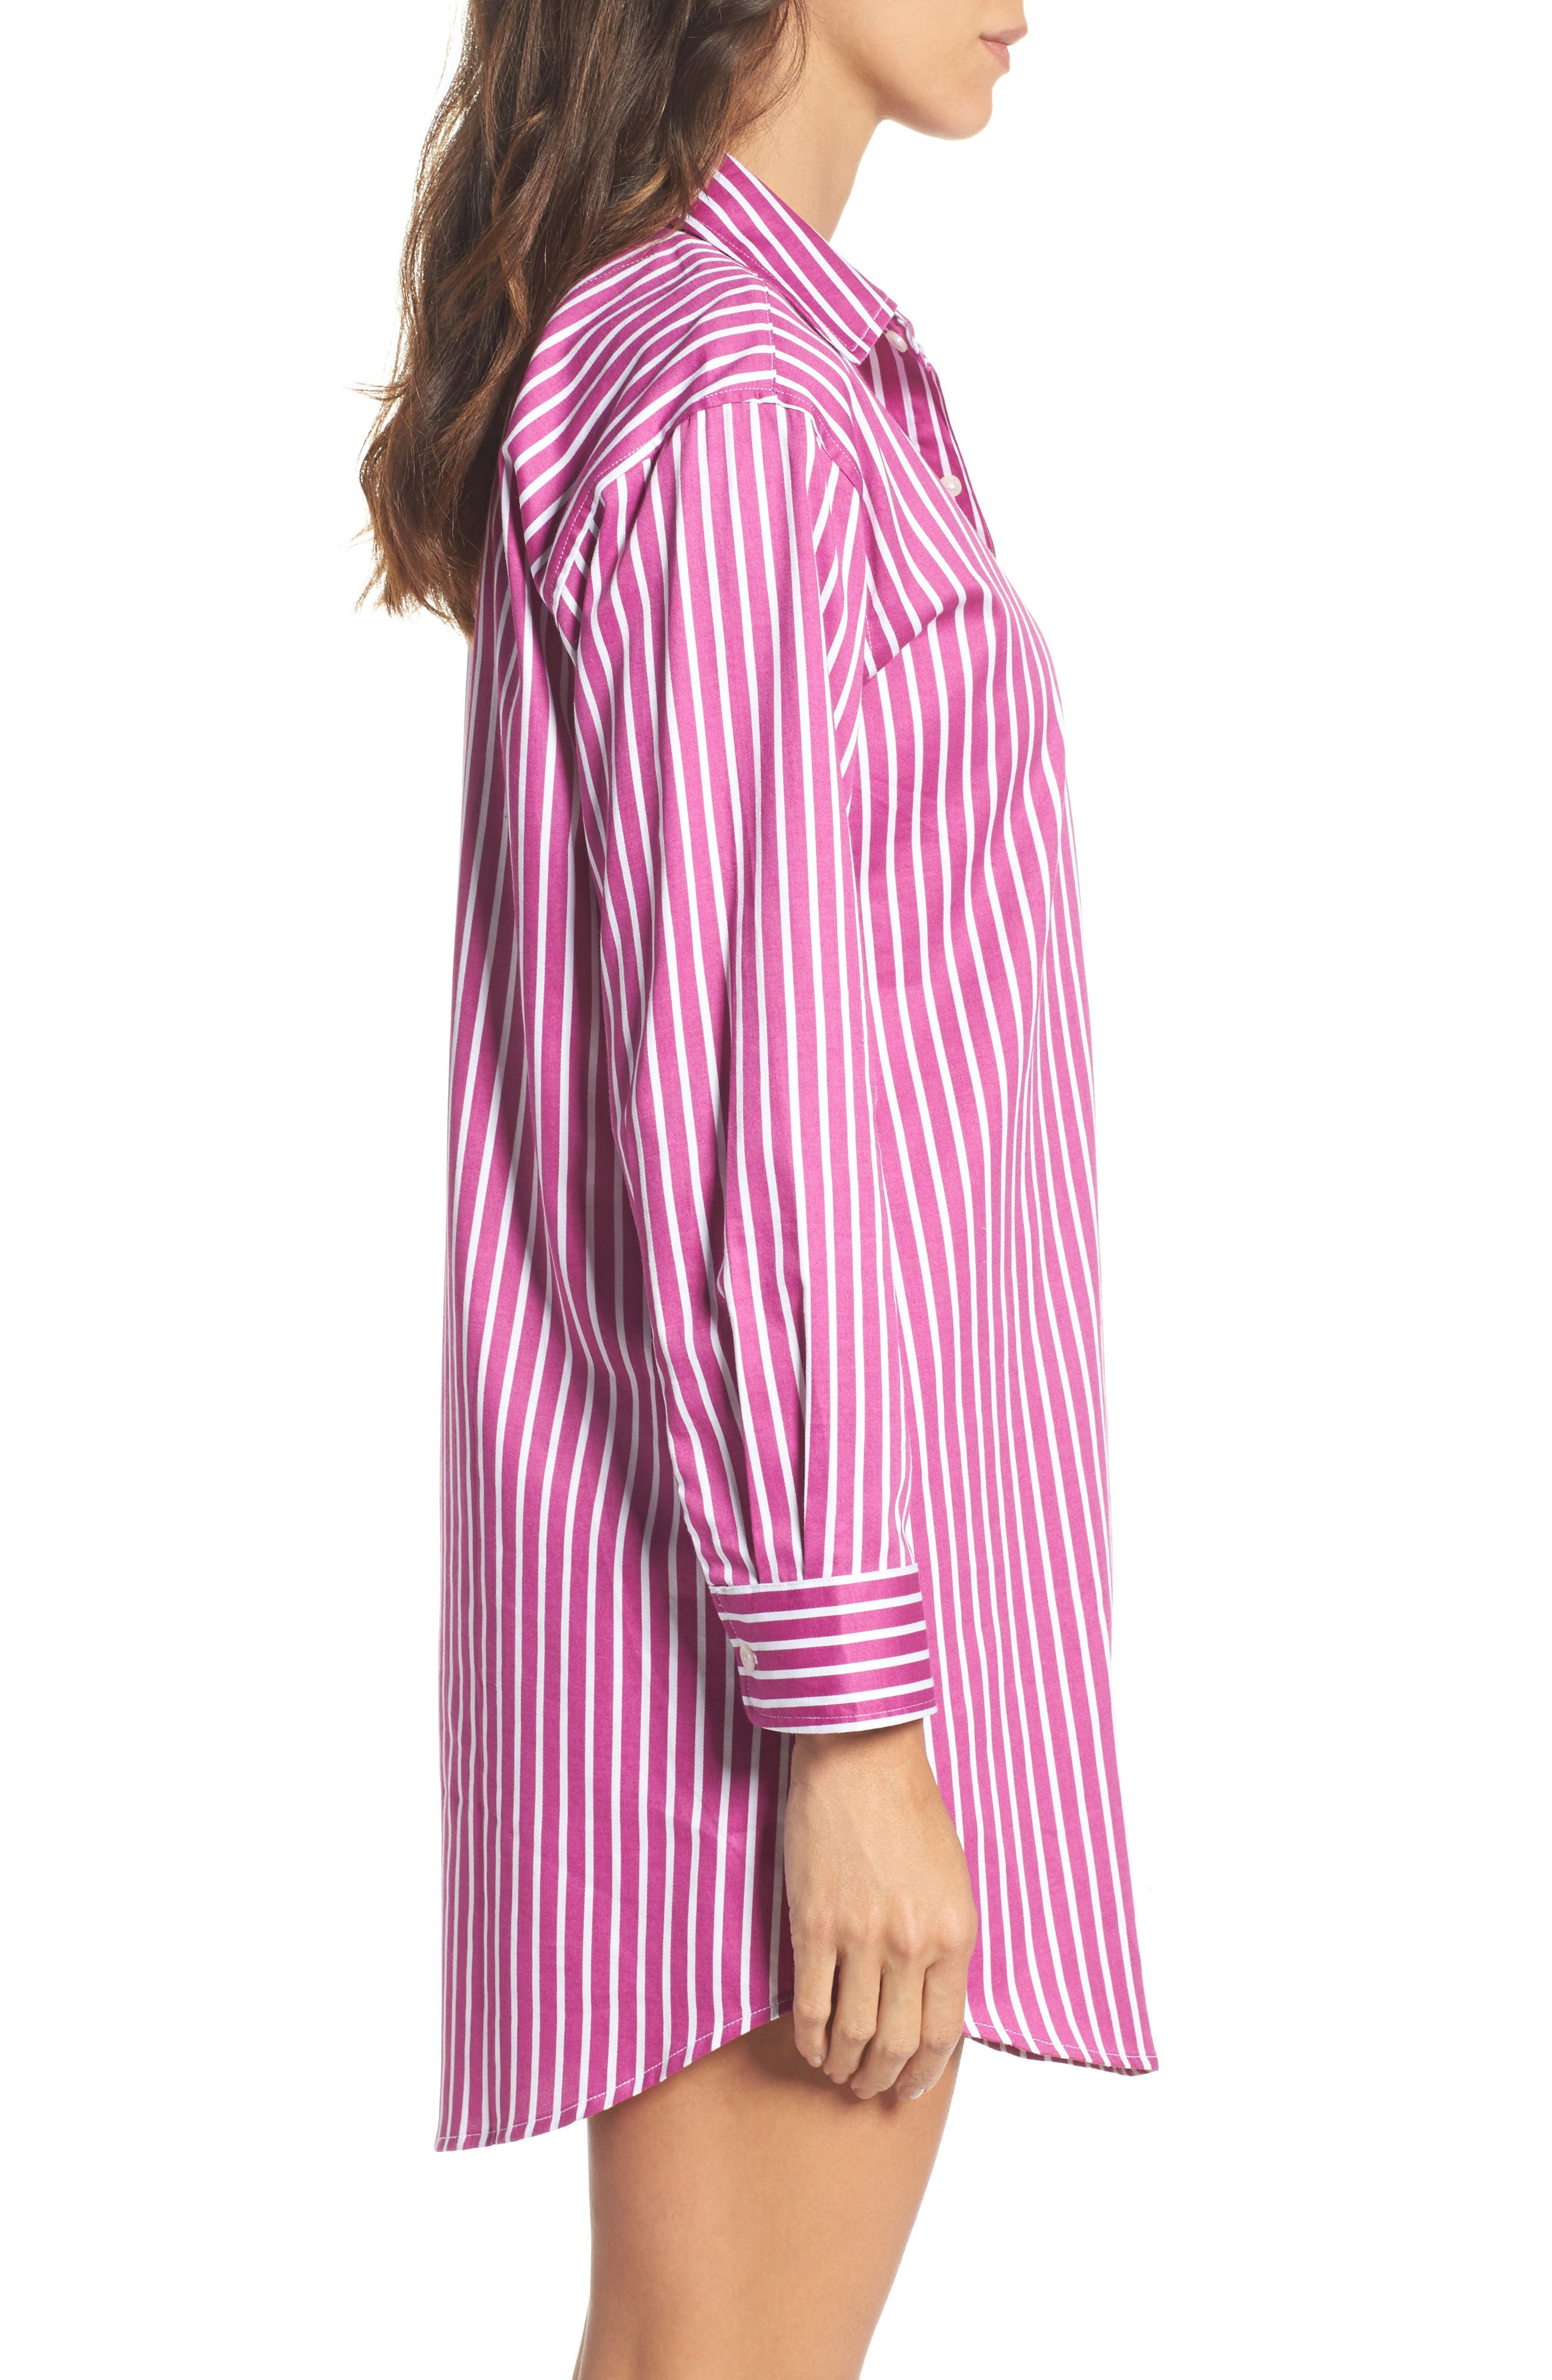 Sleep Shirt,                             Alternate thumbnail 3, color,                             690